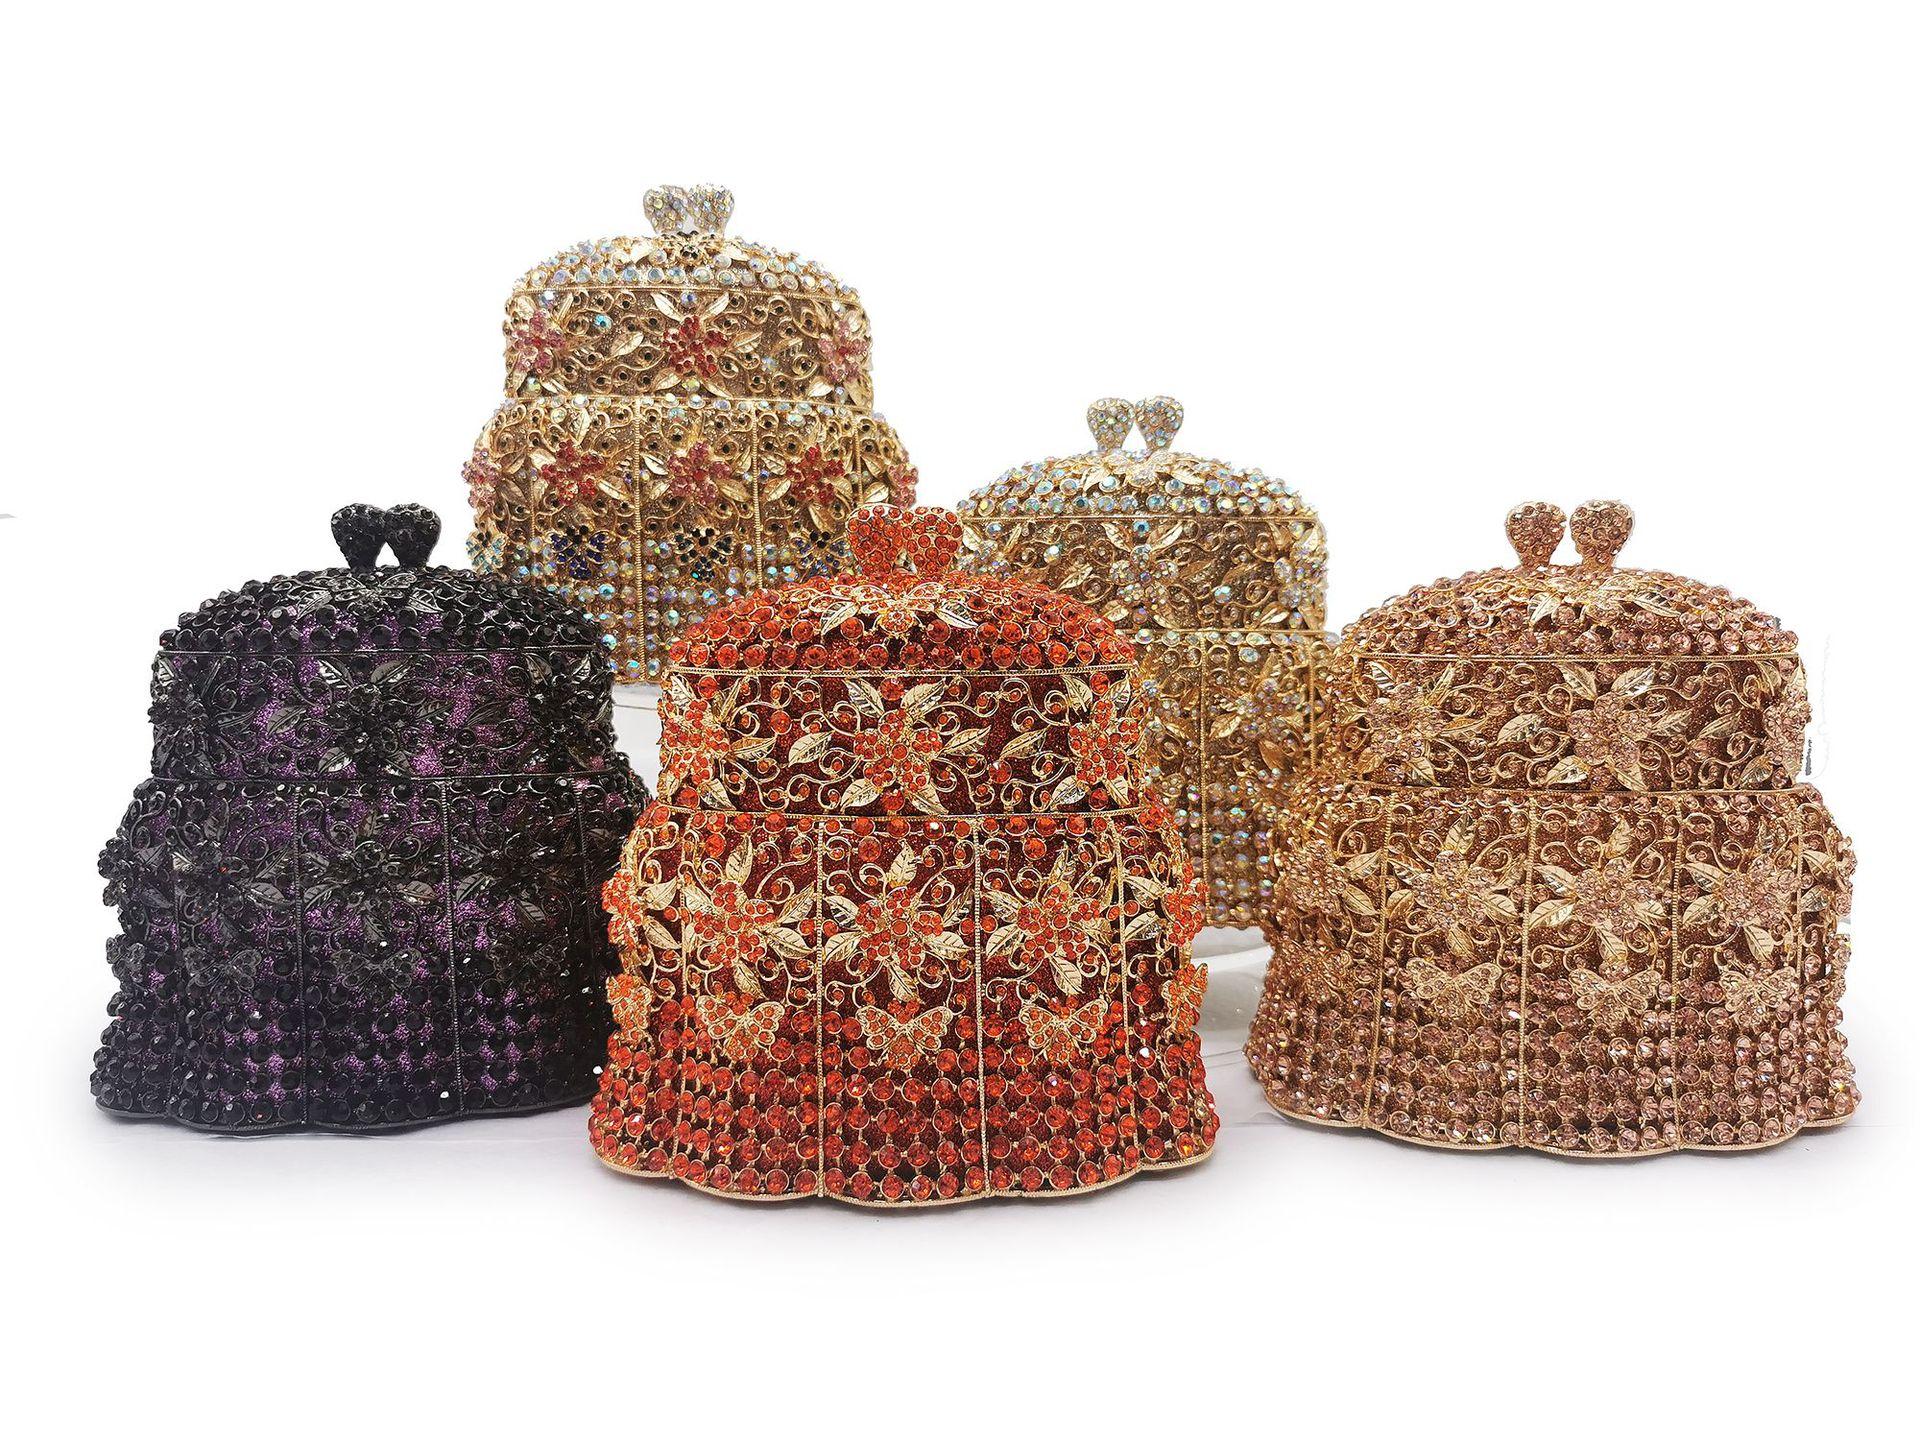 Bag For Women Luxury Bridal Wedding Party Purses Elegant Purses Women Evening Party Fashion Purses Diamonds Windbell Crystal Bag-BeeInFly